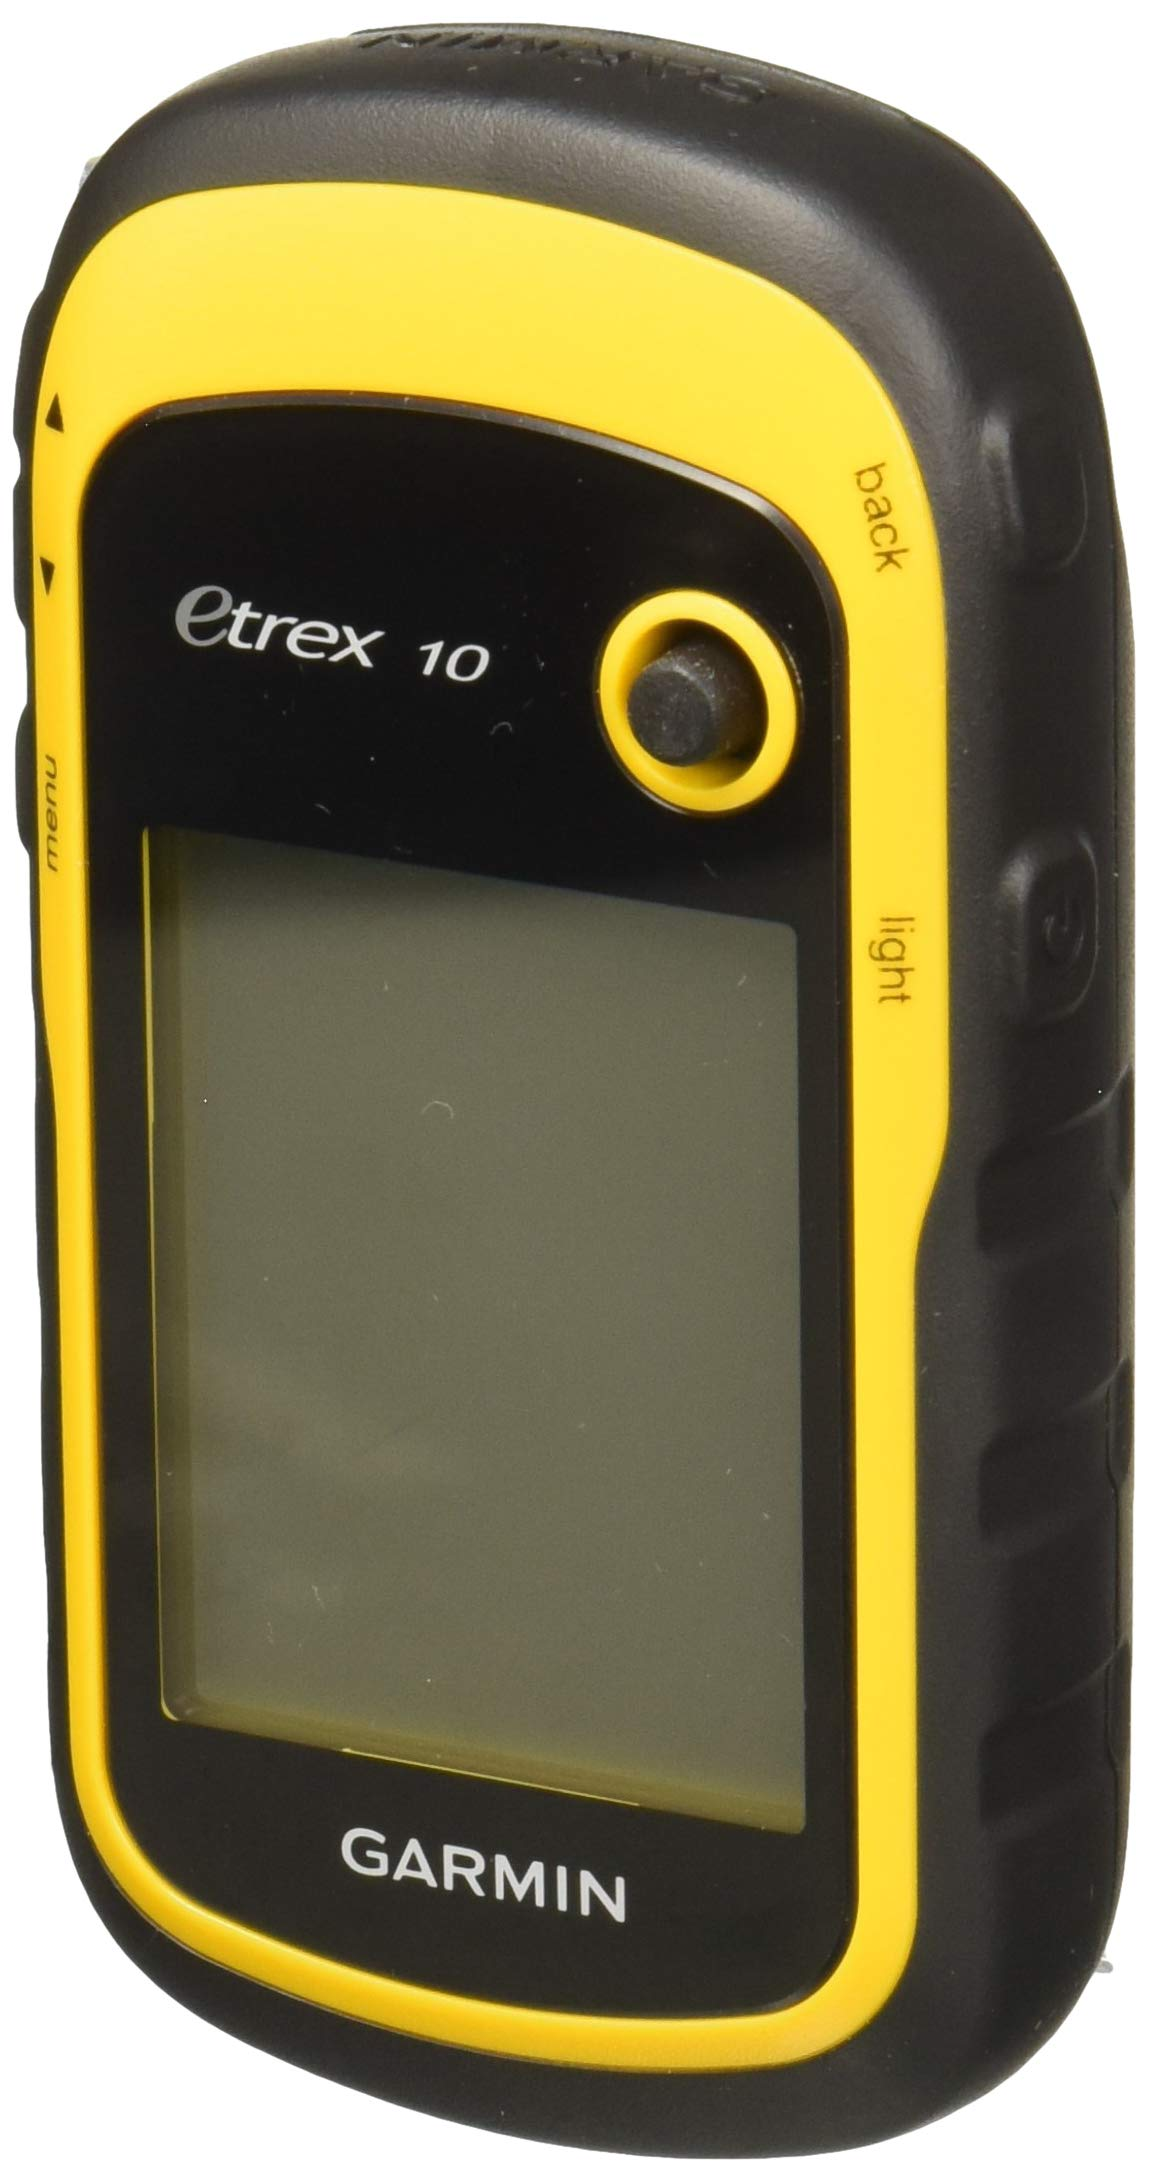 Garmin eTrex Worldwide Handheld Navigator